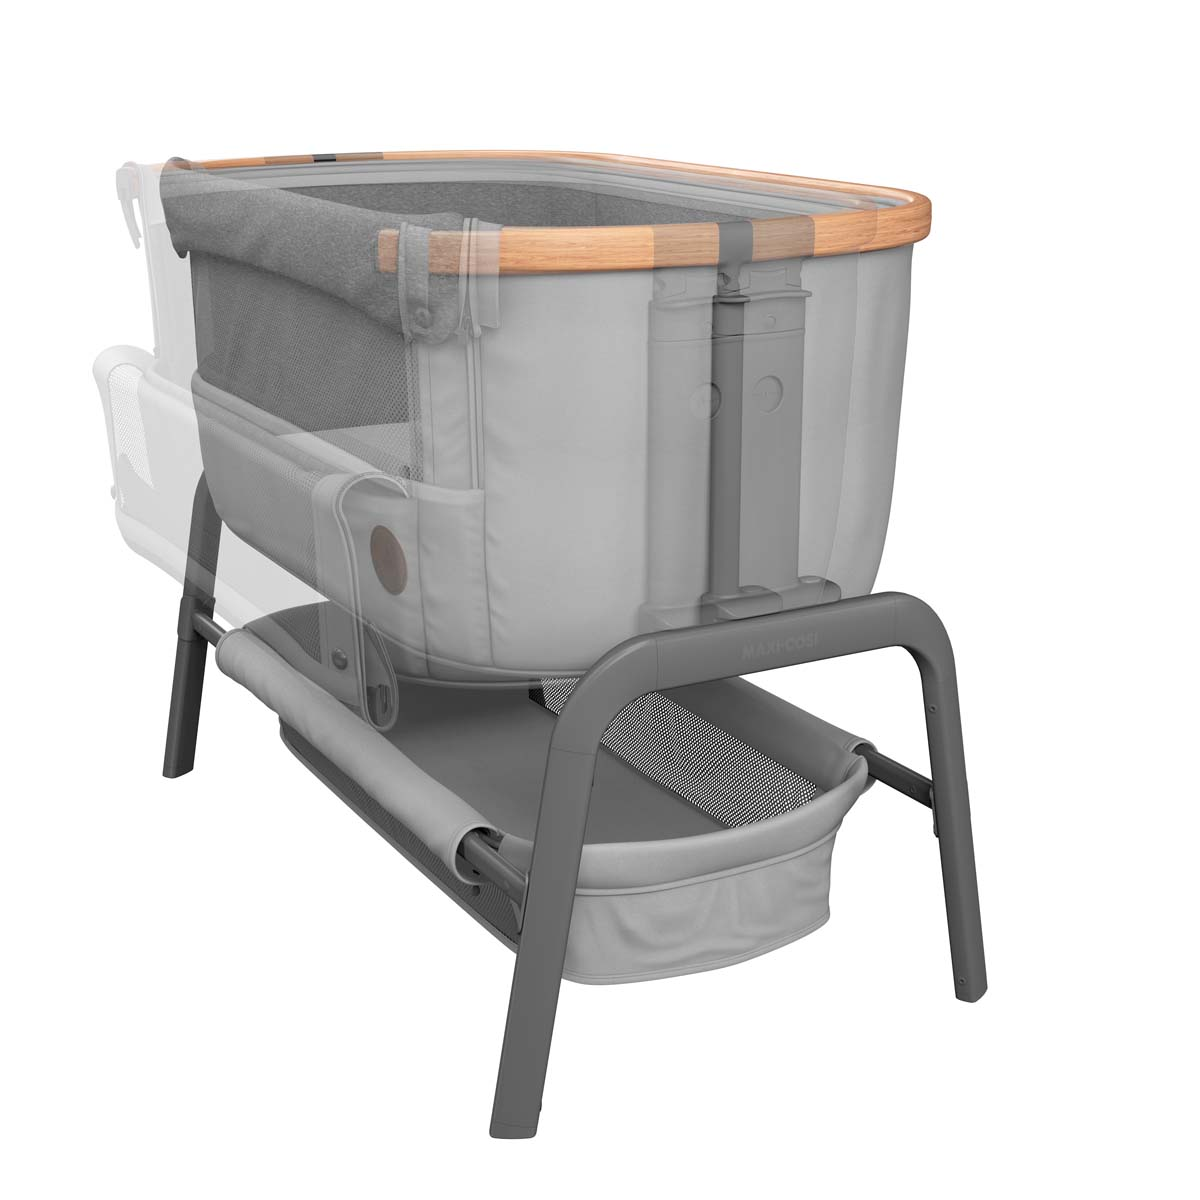 Prime Maxi Cosi Baby Crib Bedside Cot Iora 2020 Essential Grey Ibusinesslaw Wood Chair Design Ideas Ibusinesslaworg